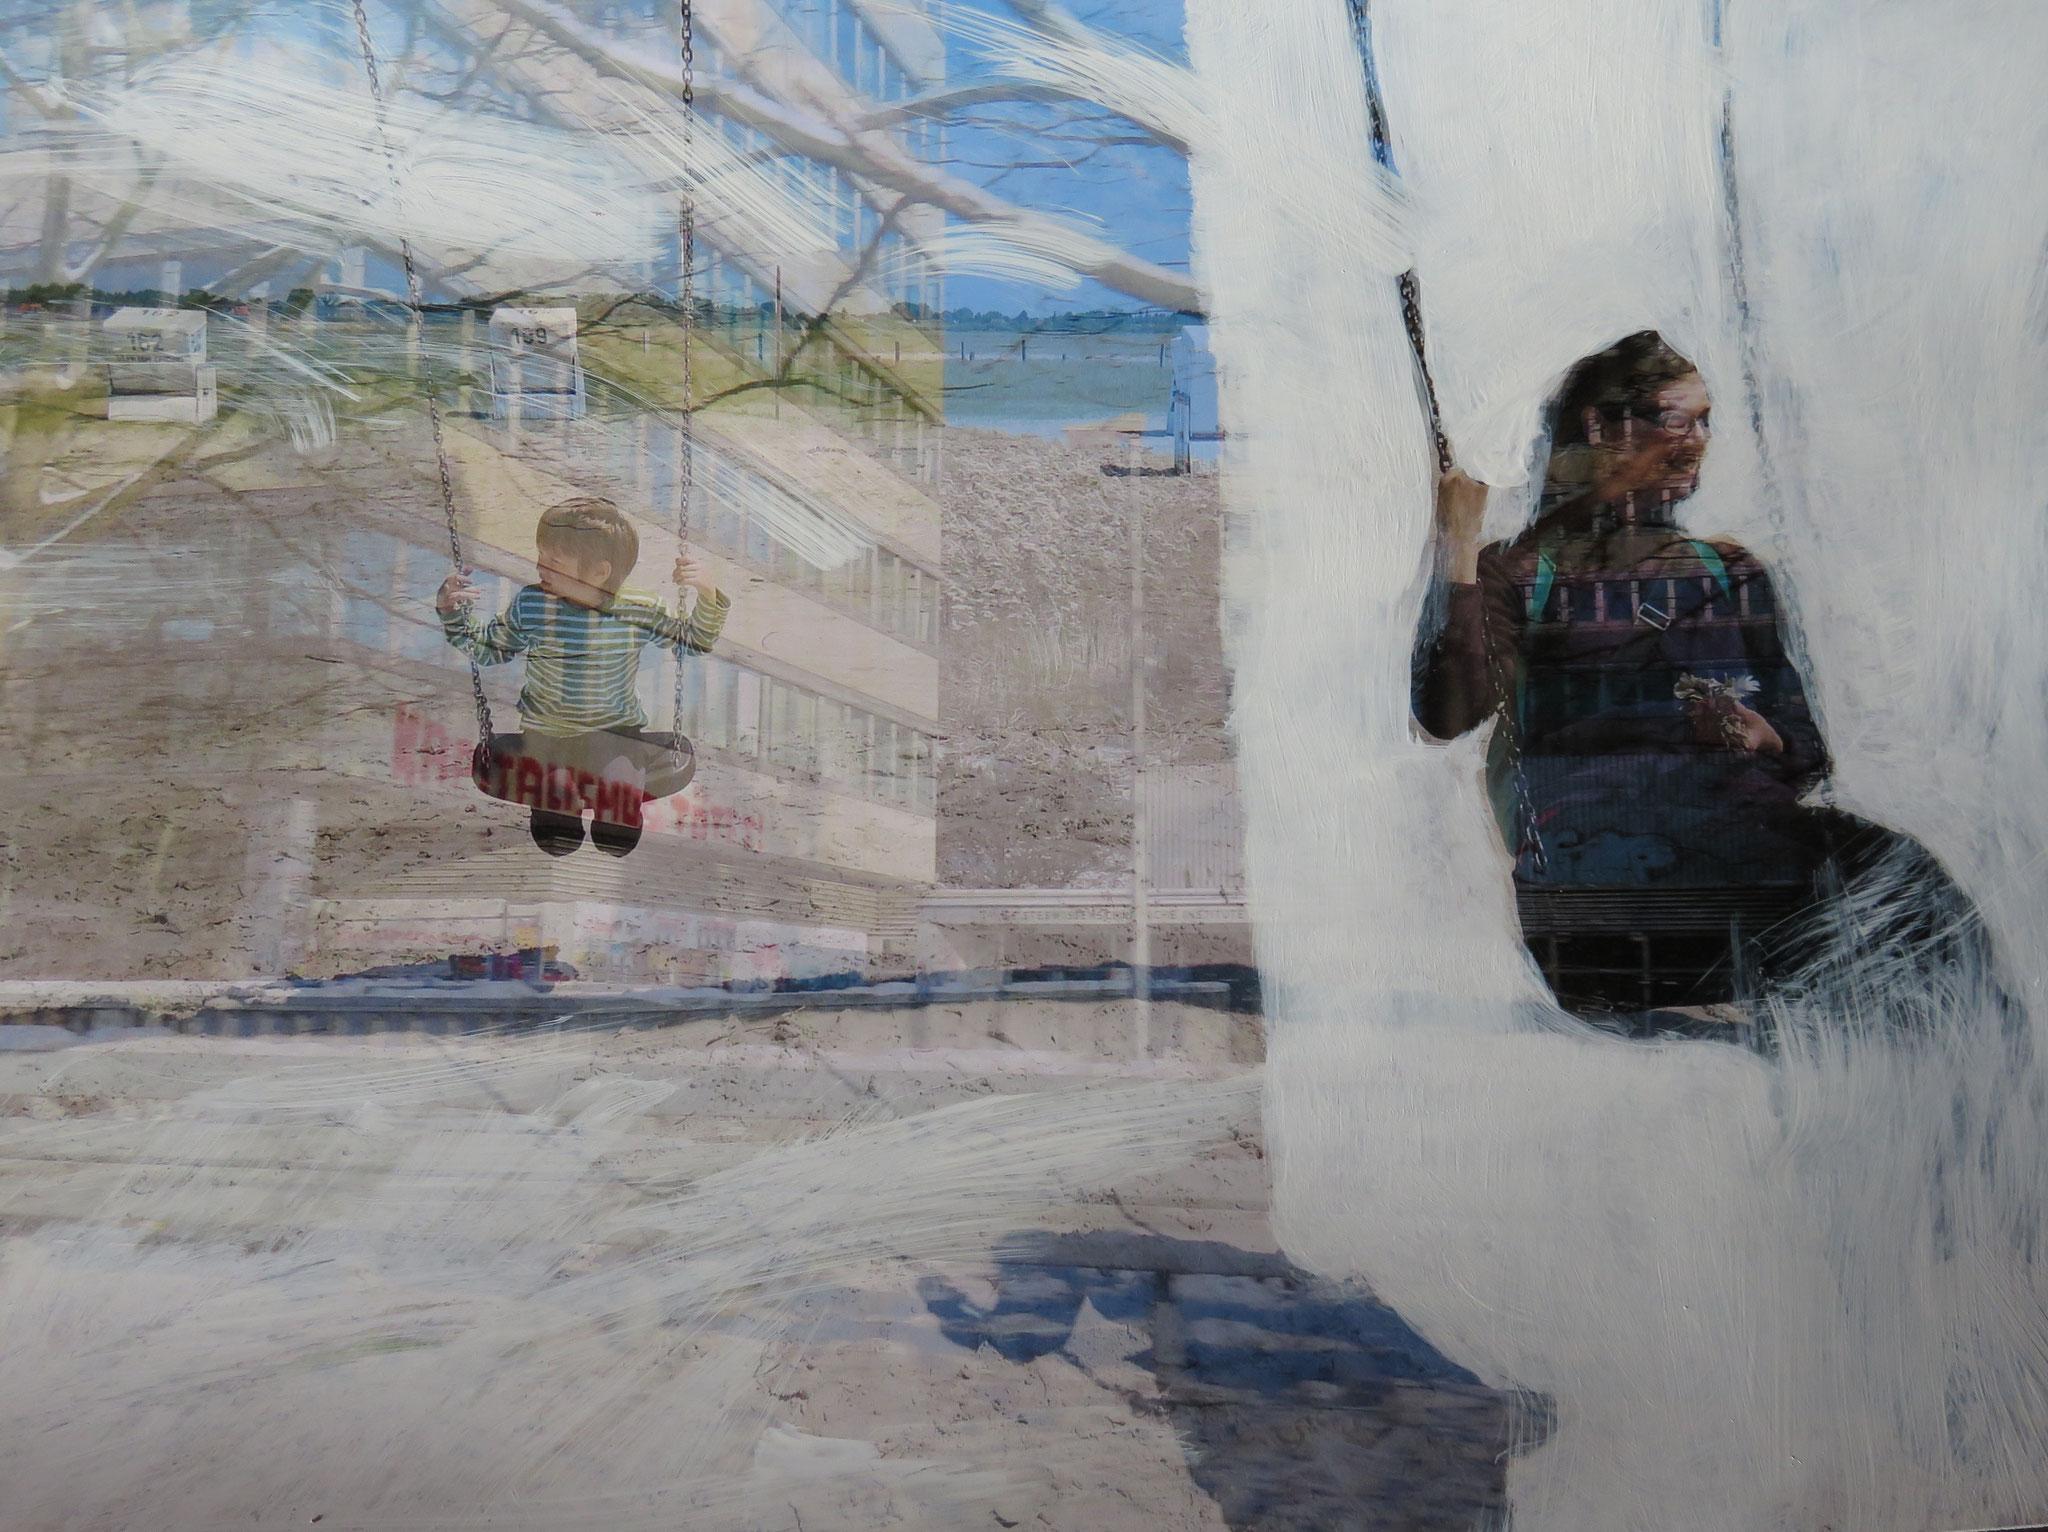 """Back forward"", digital geschichtete Fotografie, Acrylfarbe auf Foto, Ausstellung ""Fundamental Ephemeris"""